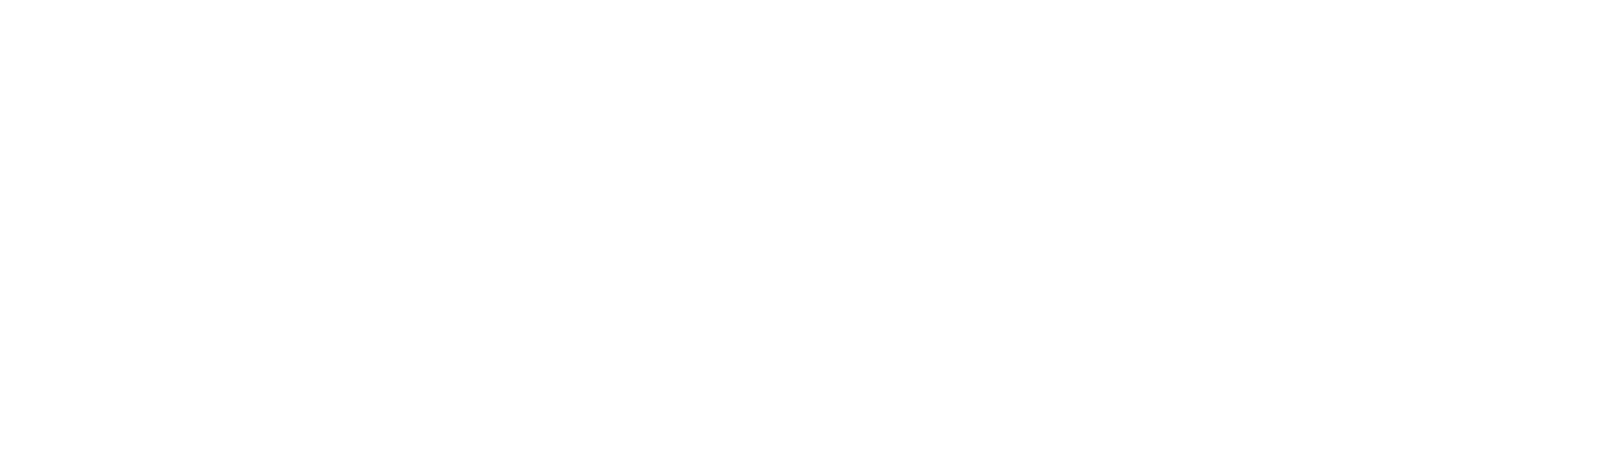 Almanaque Tepeji